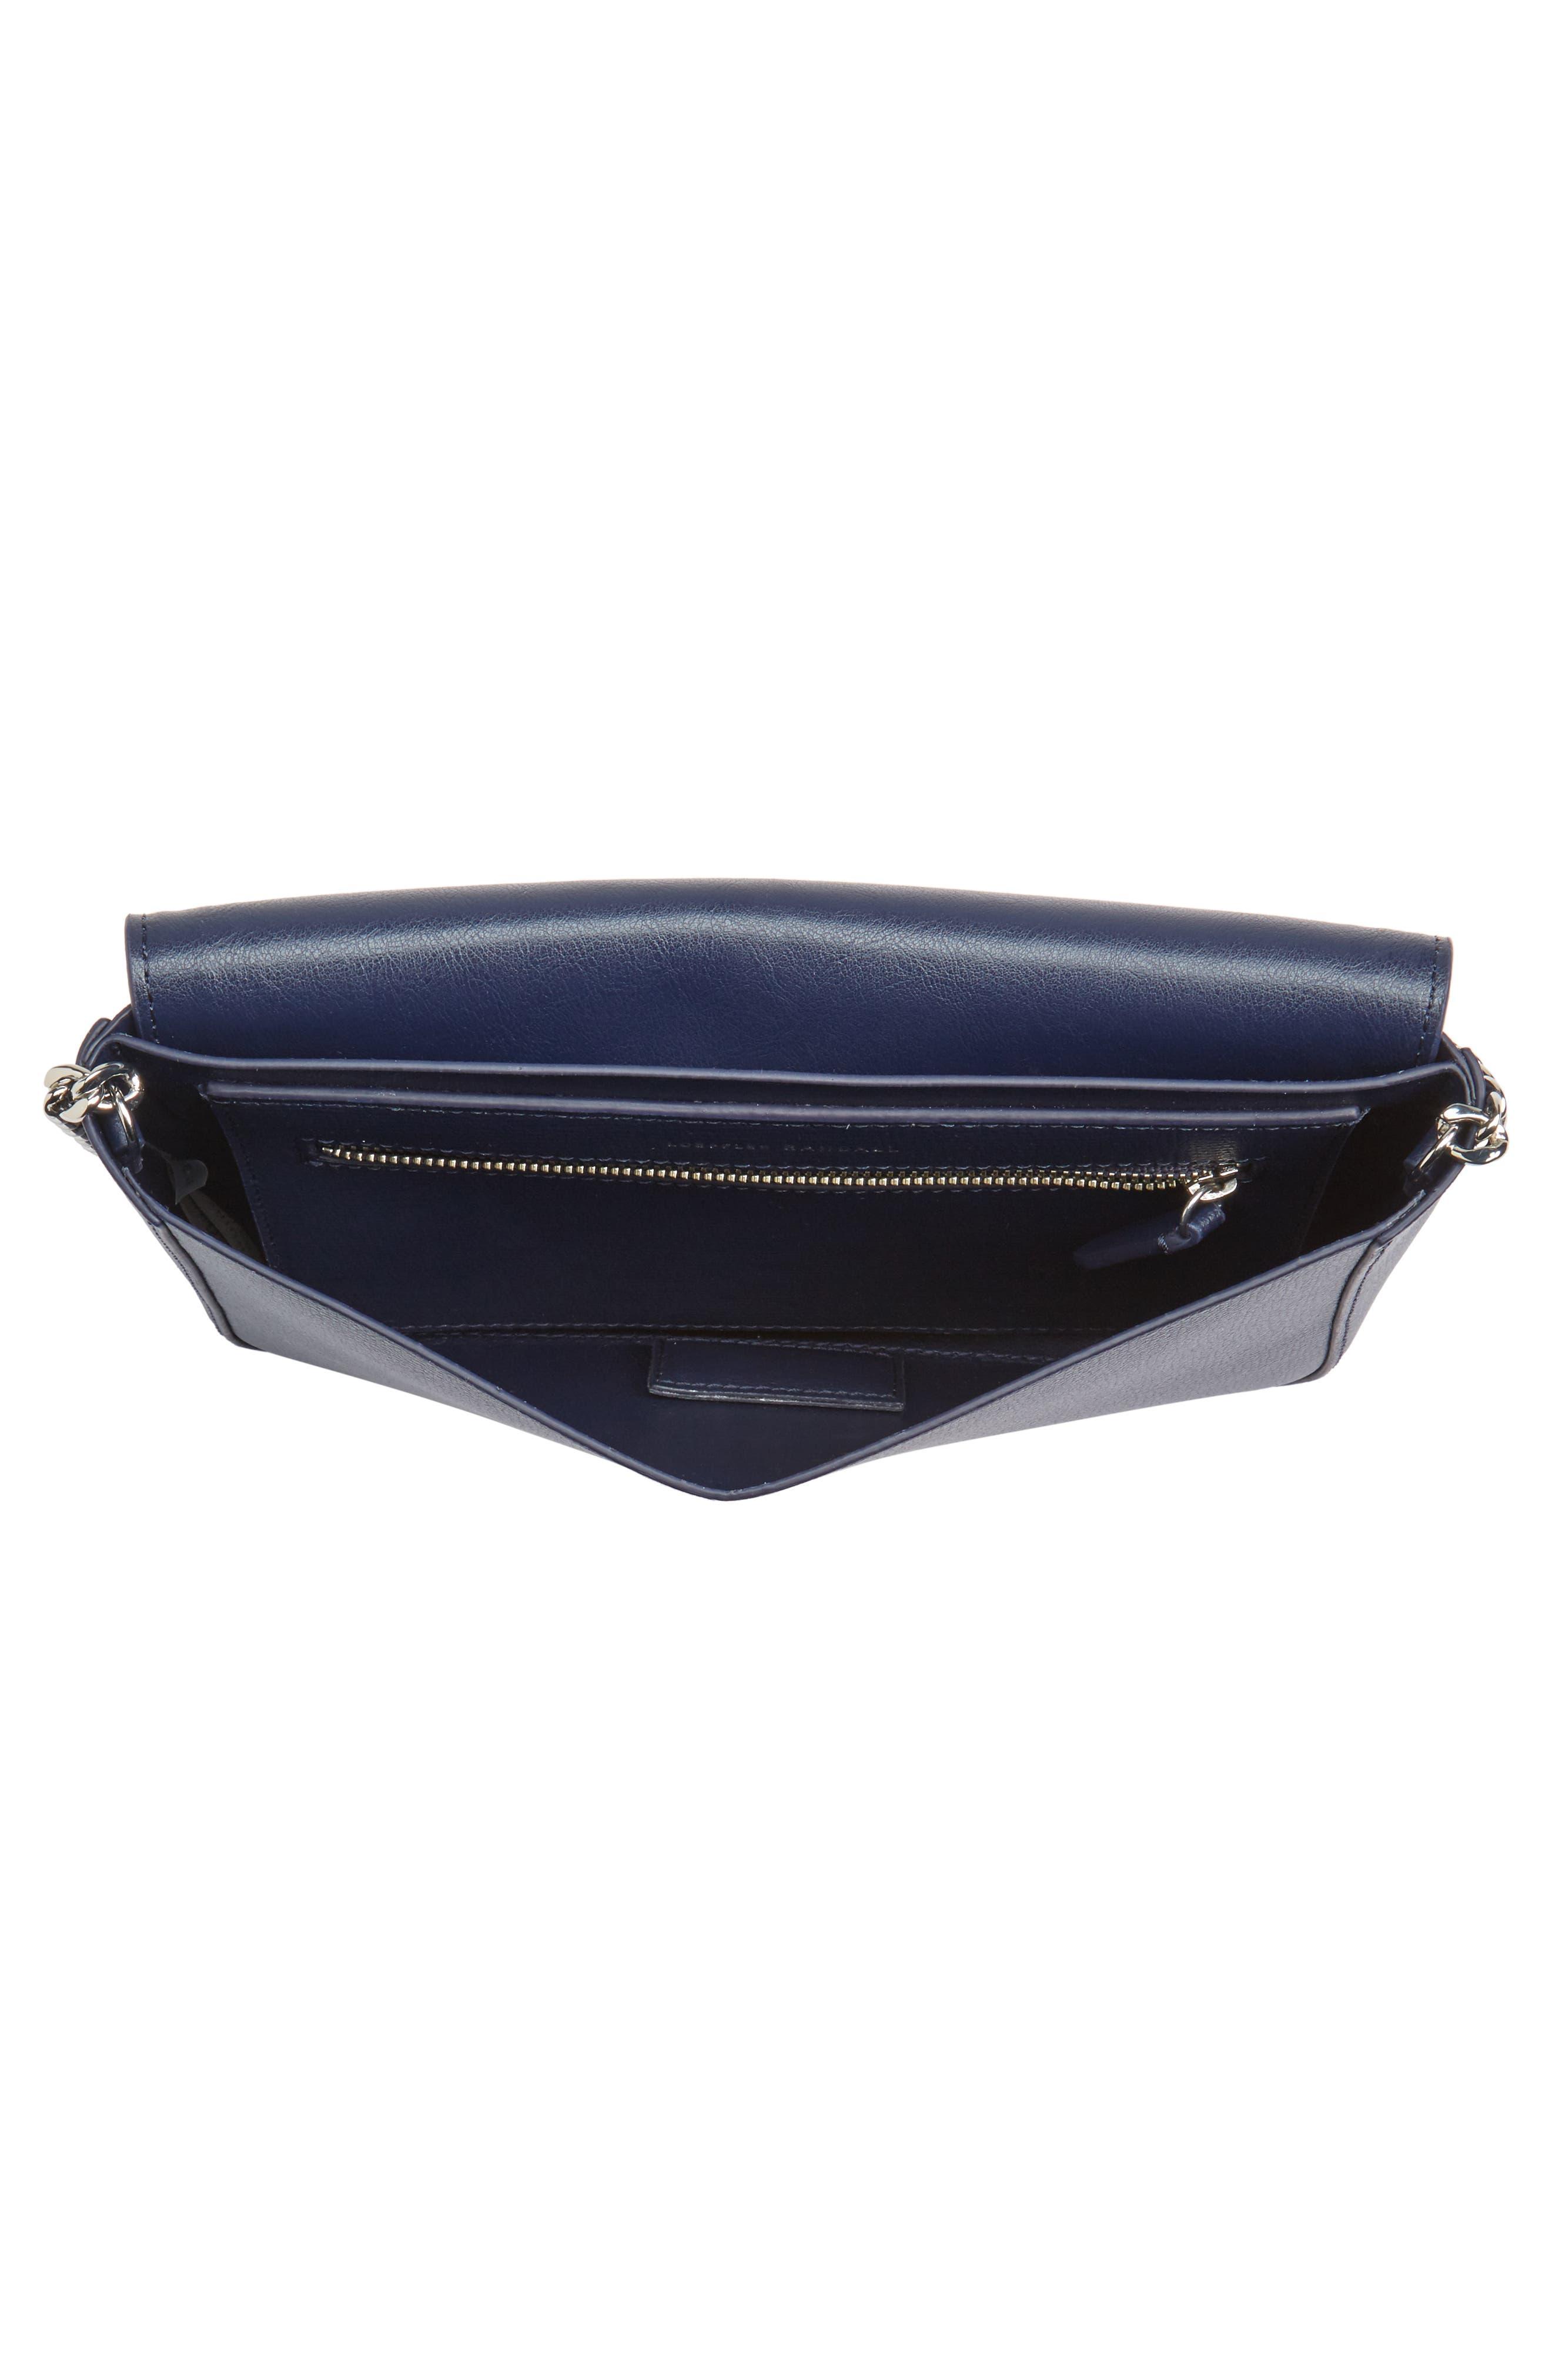 Lock Leather Flap Clutch/Shoulder Bag,                             Alternate thumbnail 4, color,